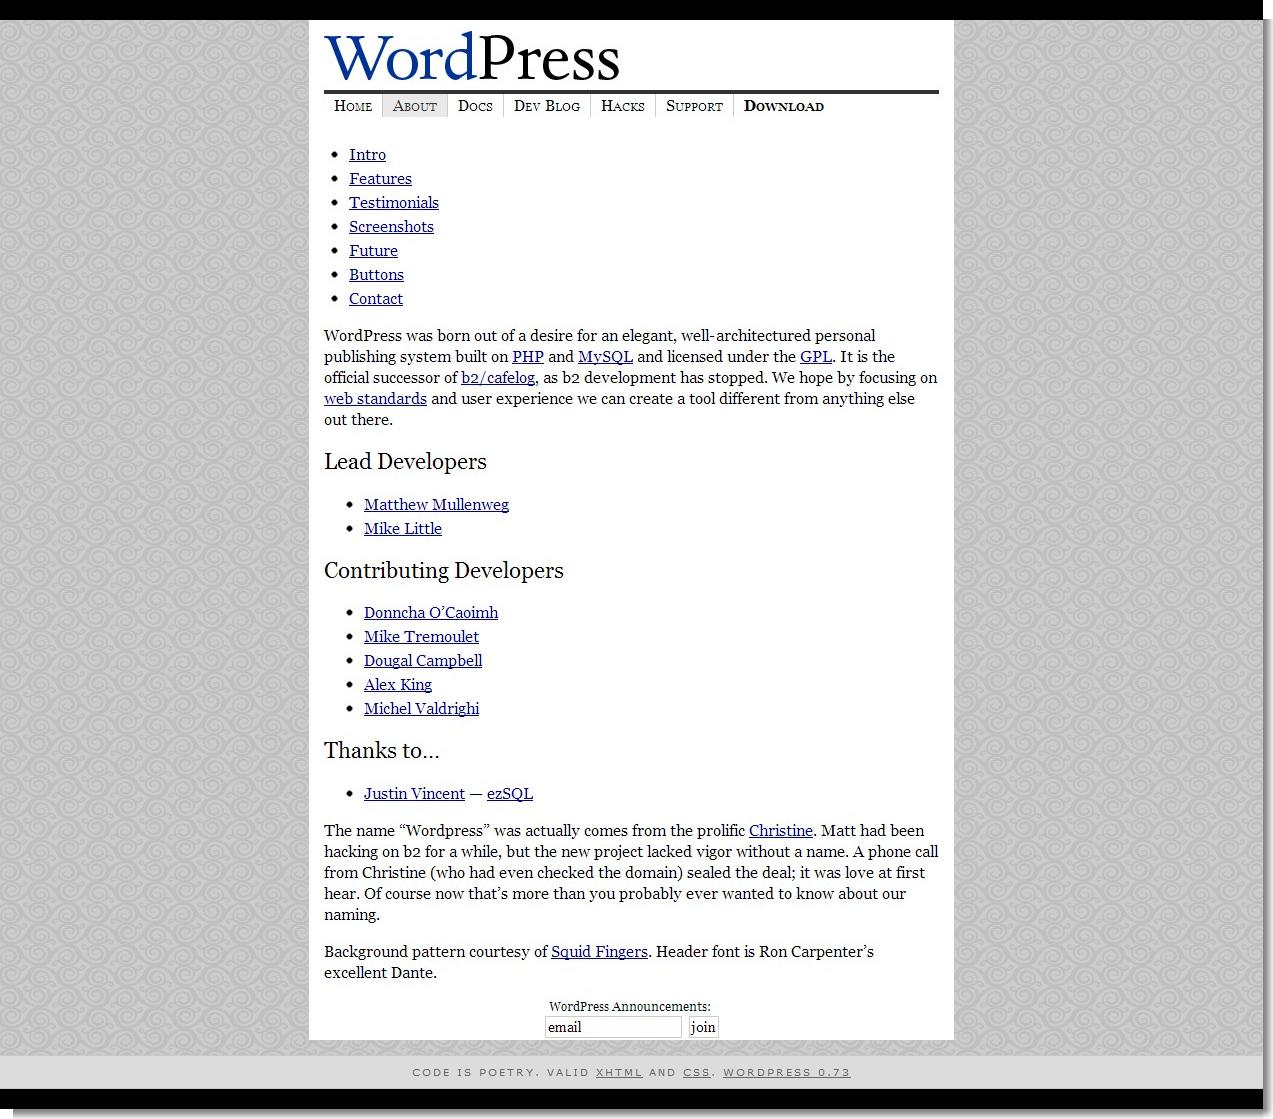 December 02, 2003 - WordPress - About